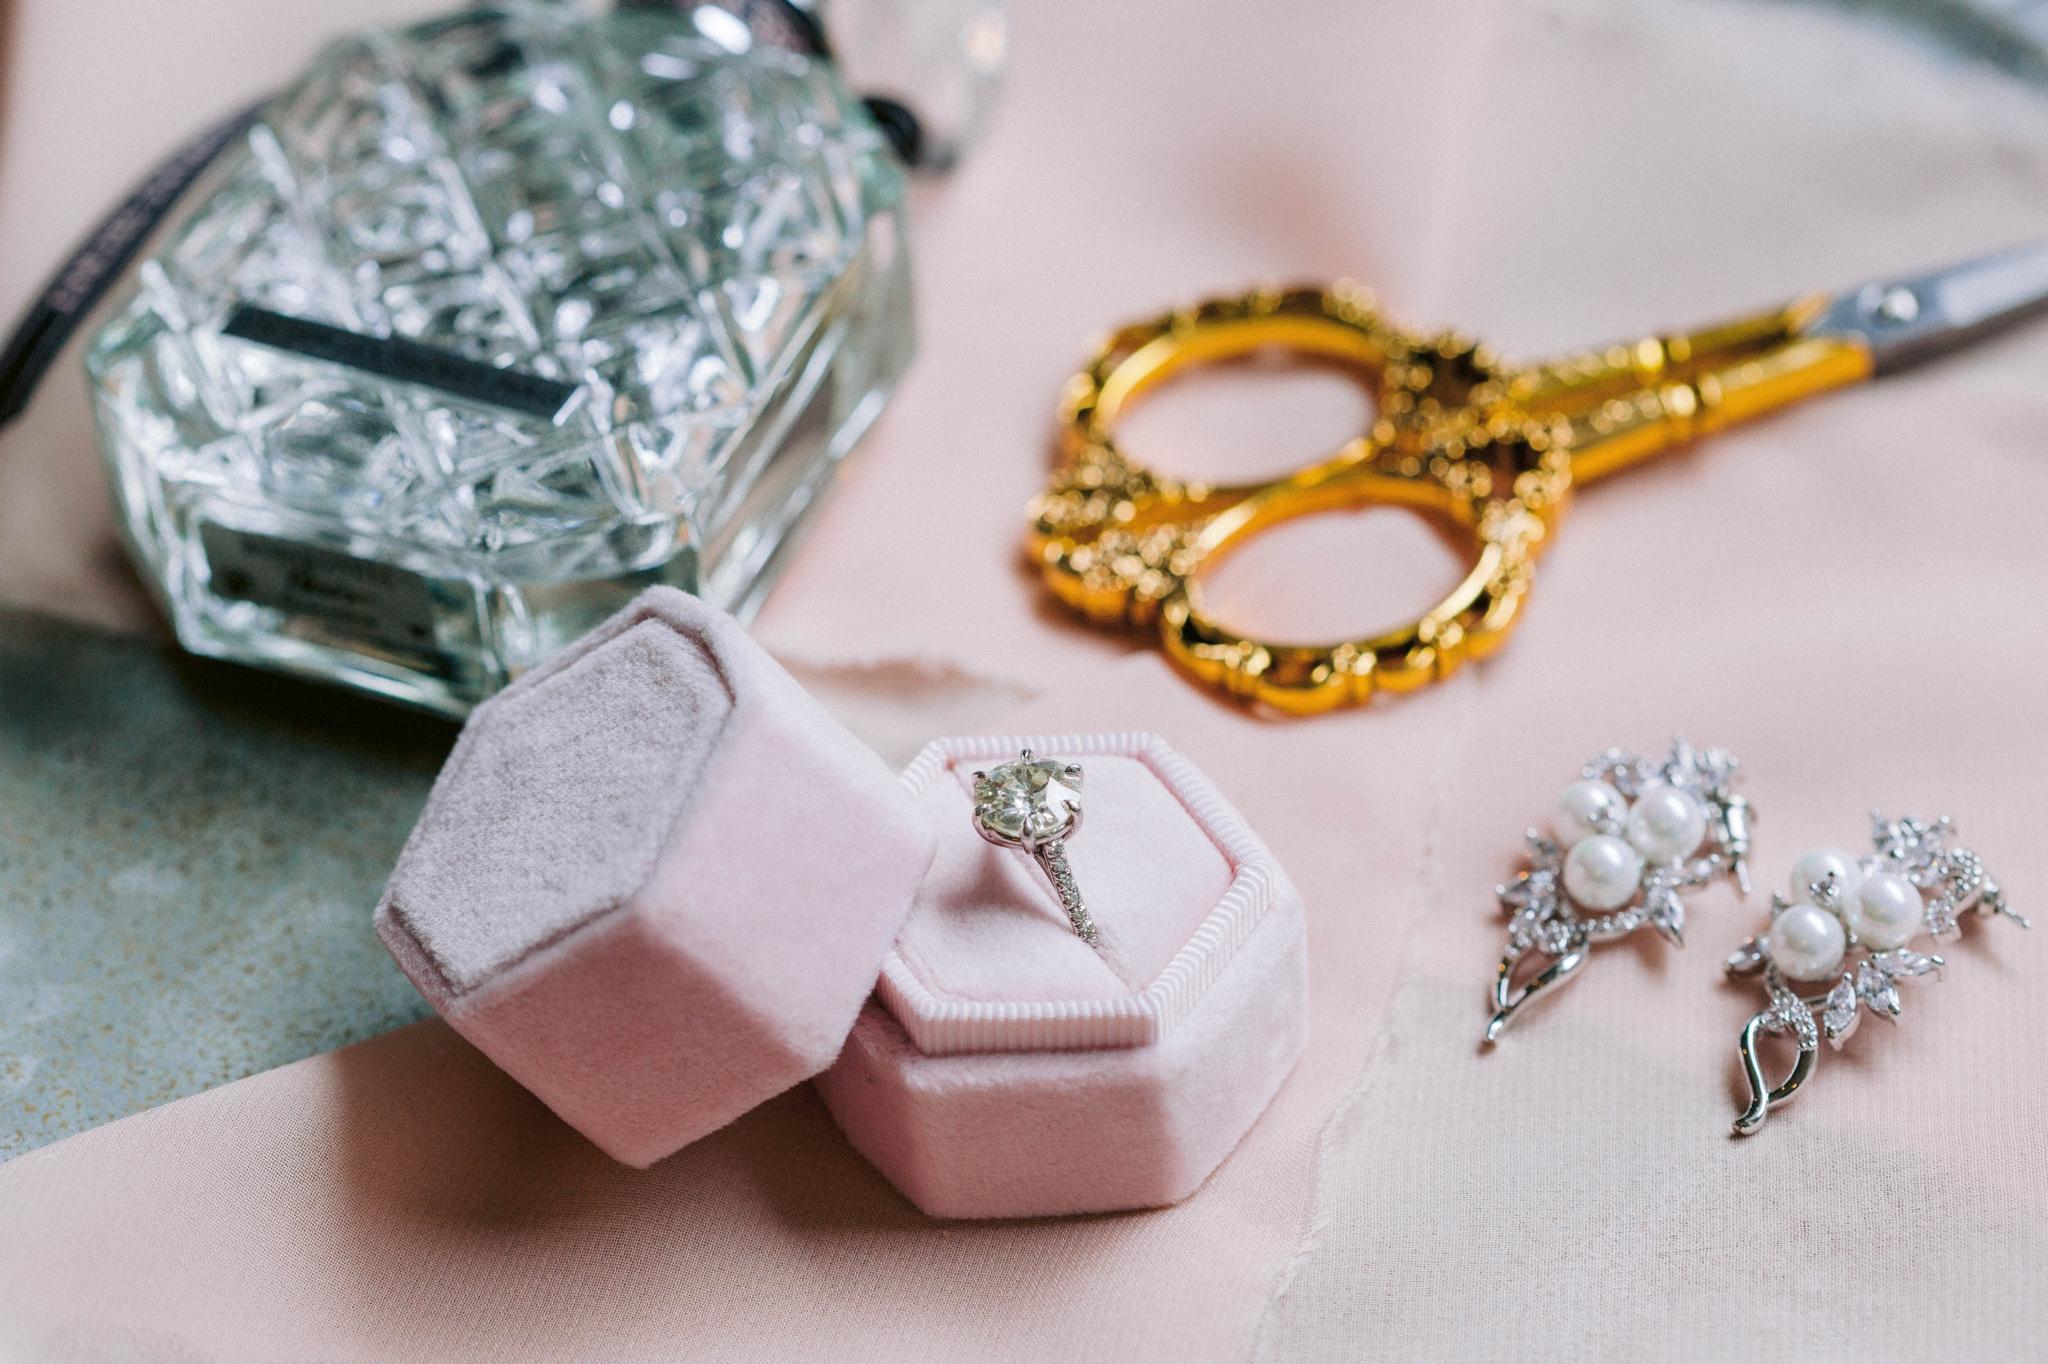 engagement ring in blush velvet ring box with gold scissors  - Honolulu Oahu Hawaii Wedding Photographer